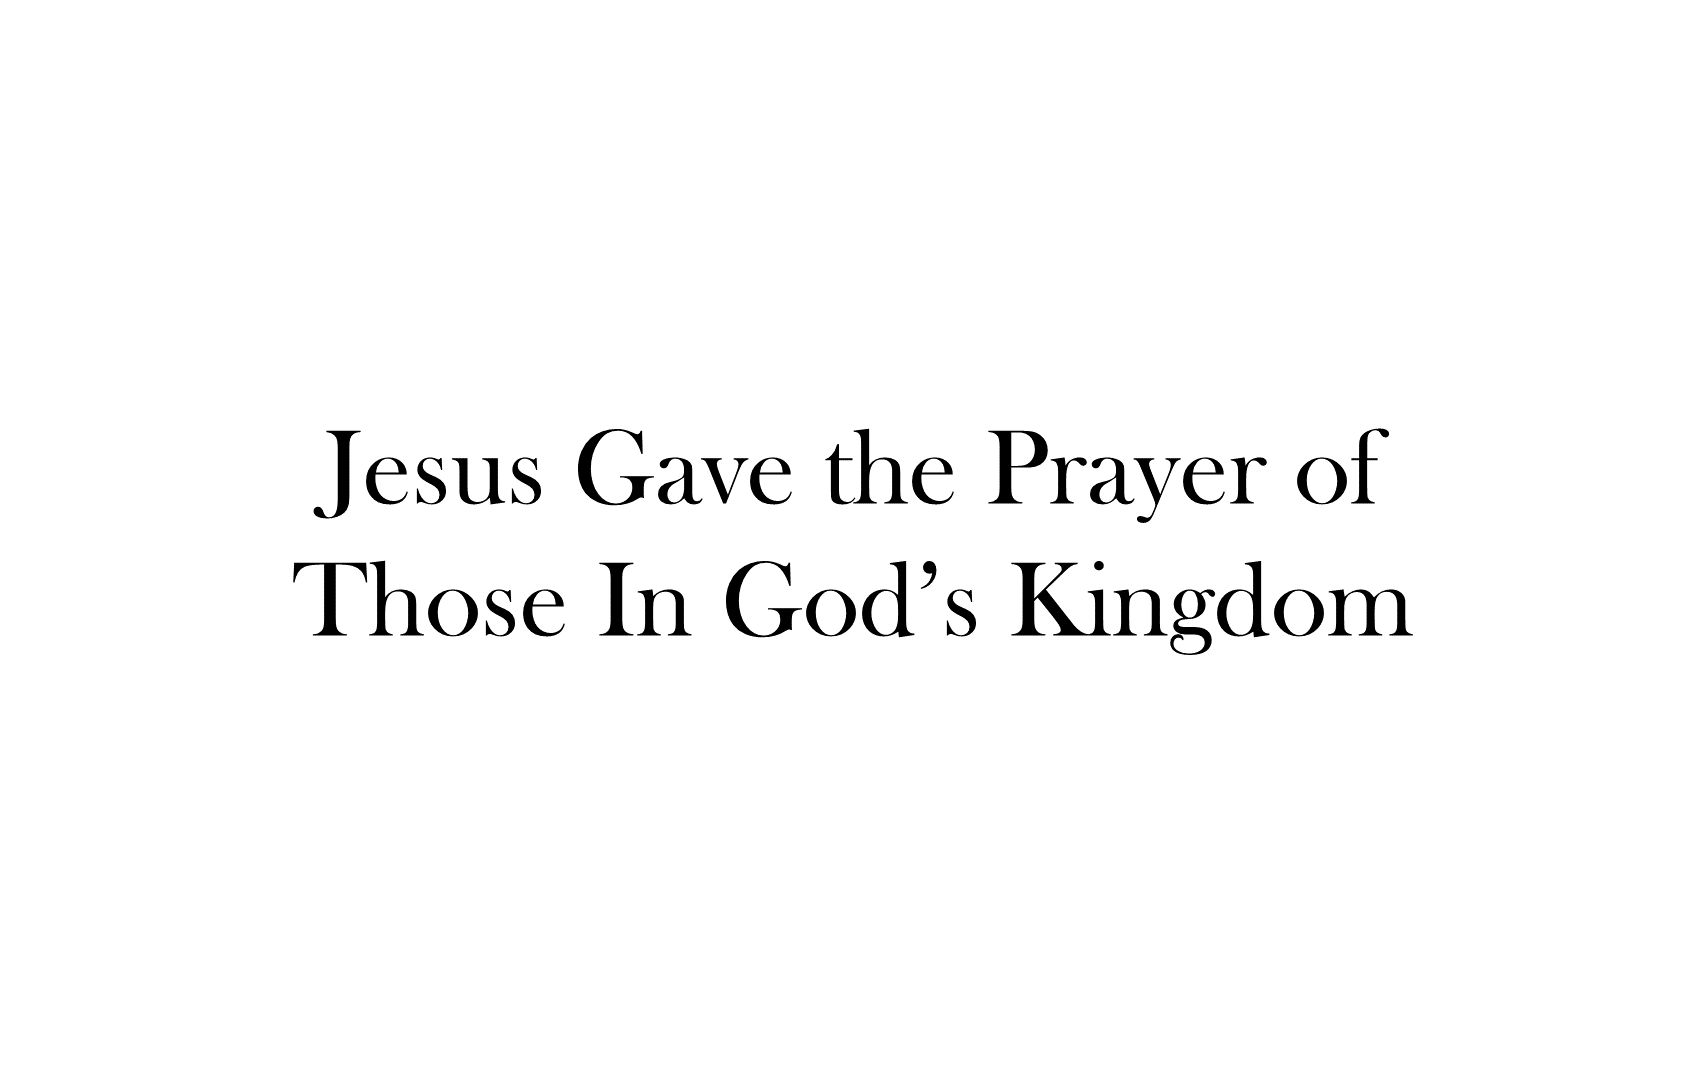 ESH-20 - The Discipline Of Disciple-Making - Seeing, Understanding, Entering, Living, & Seeking The Kingdom Of God ( (21)